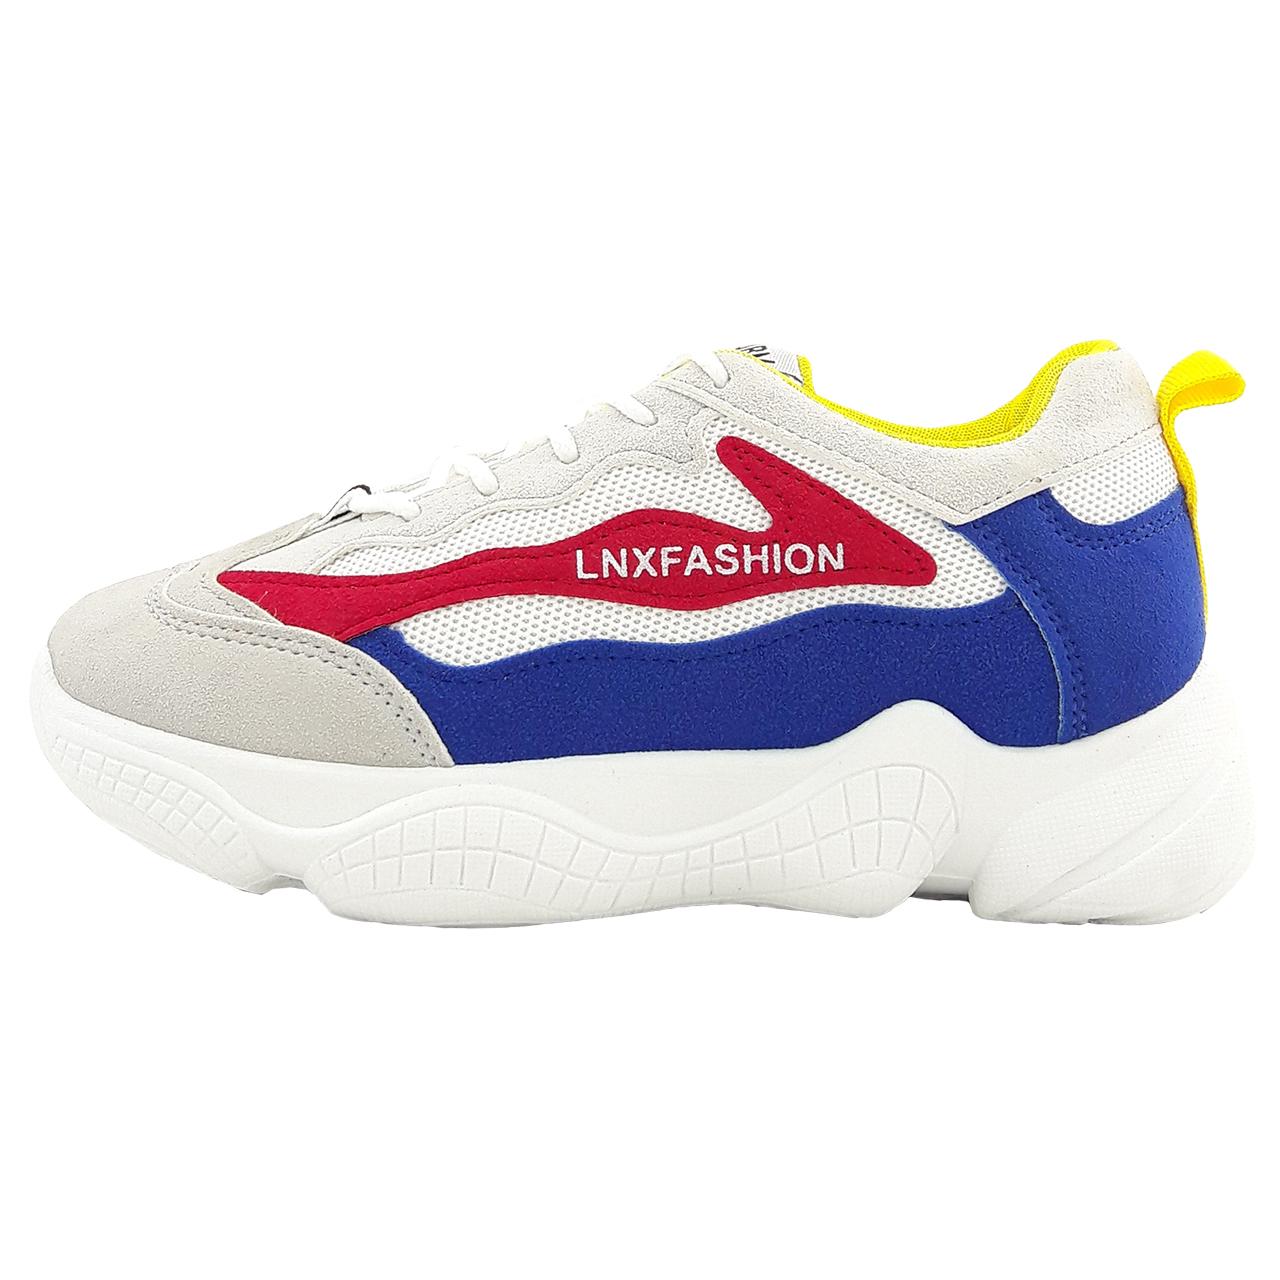 کفش راحتی زنانه فشن مدل Lxn rd.bl.gry01